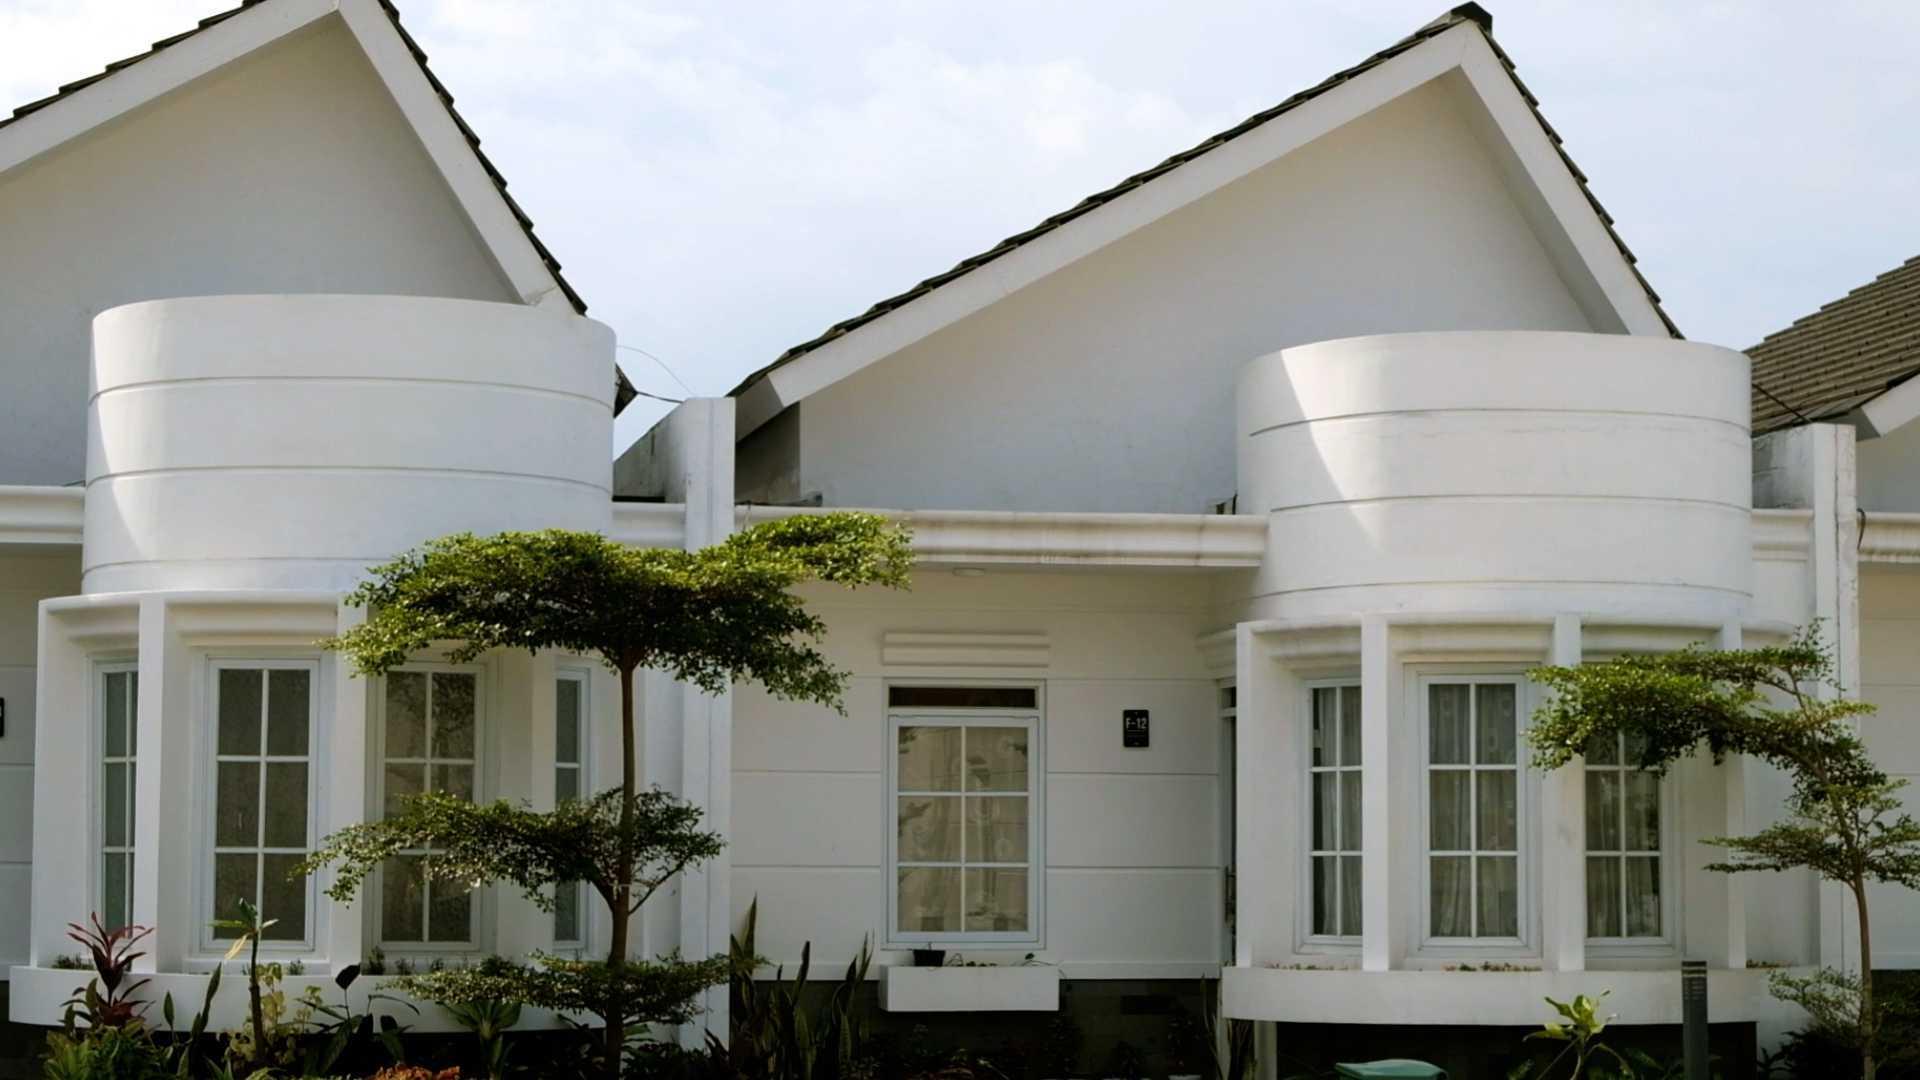 Kad Firma Arsitektur Bentang Artha Residence Bandung, Kota Bandung, Jawa Barat, Indonesia Bandung, Kota Bandung, Jawa Barat, Indonesia Kad-Firma-Arsitektur-Bentang-Artha-Residence   127674